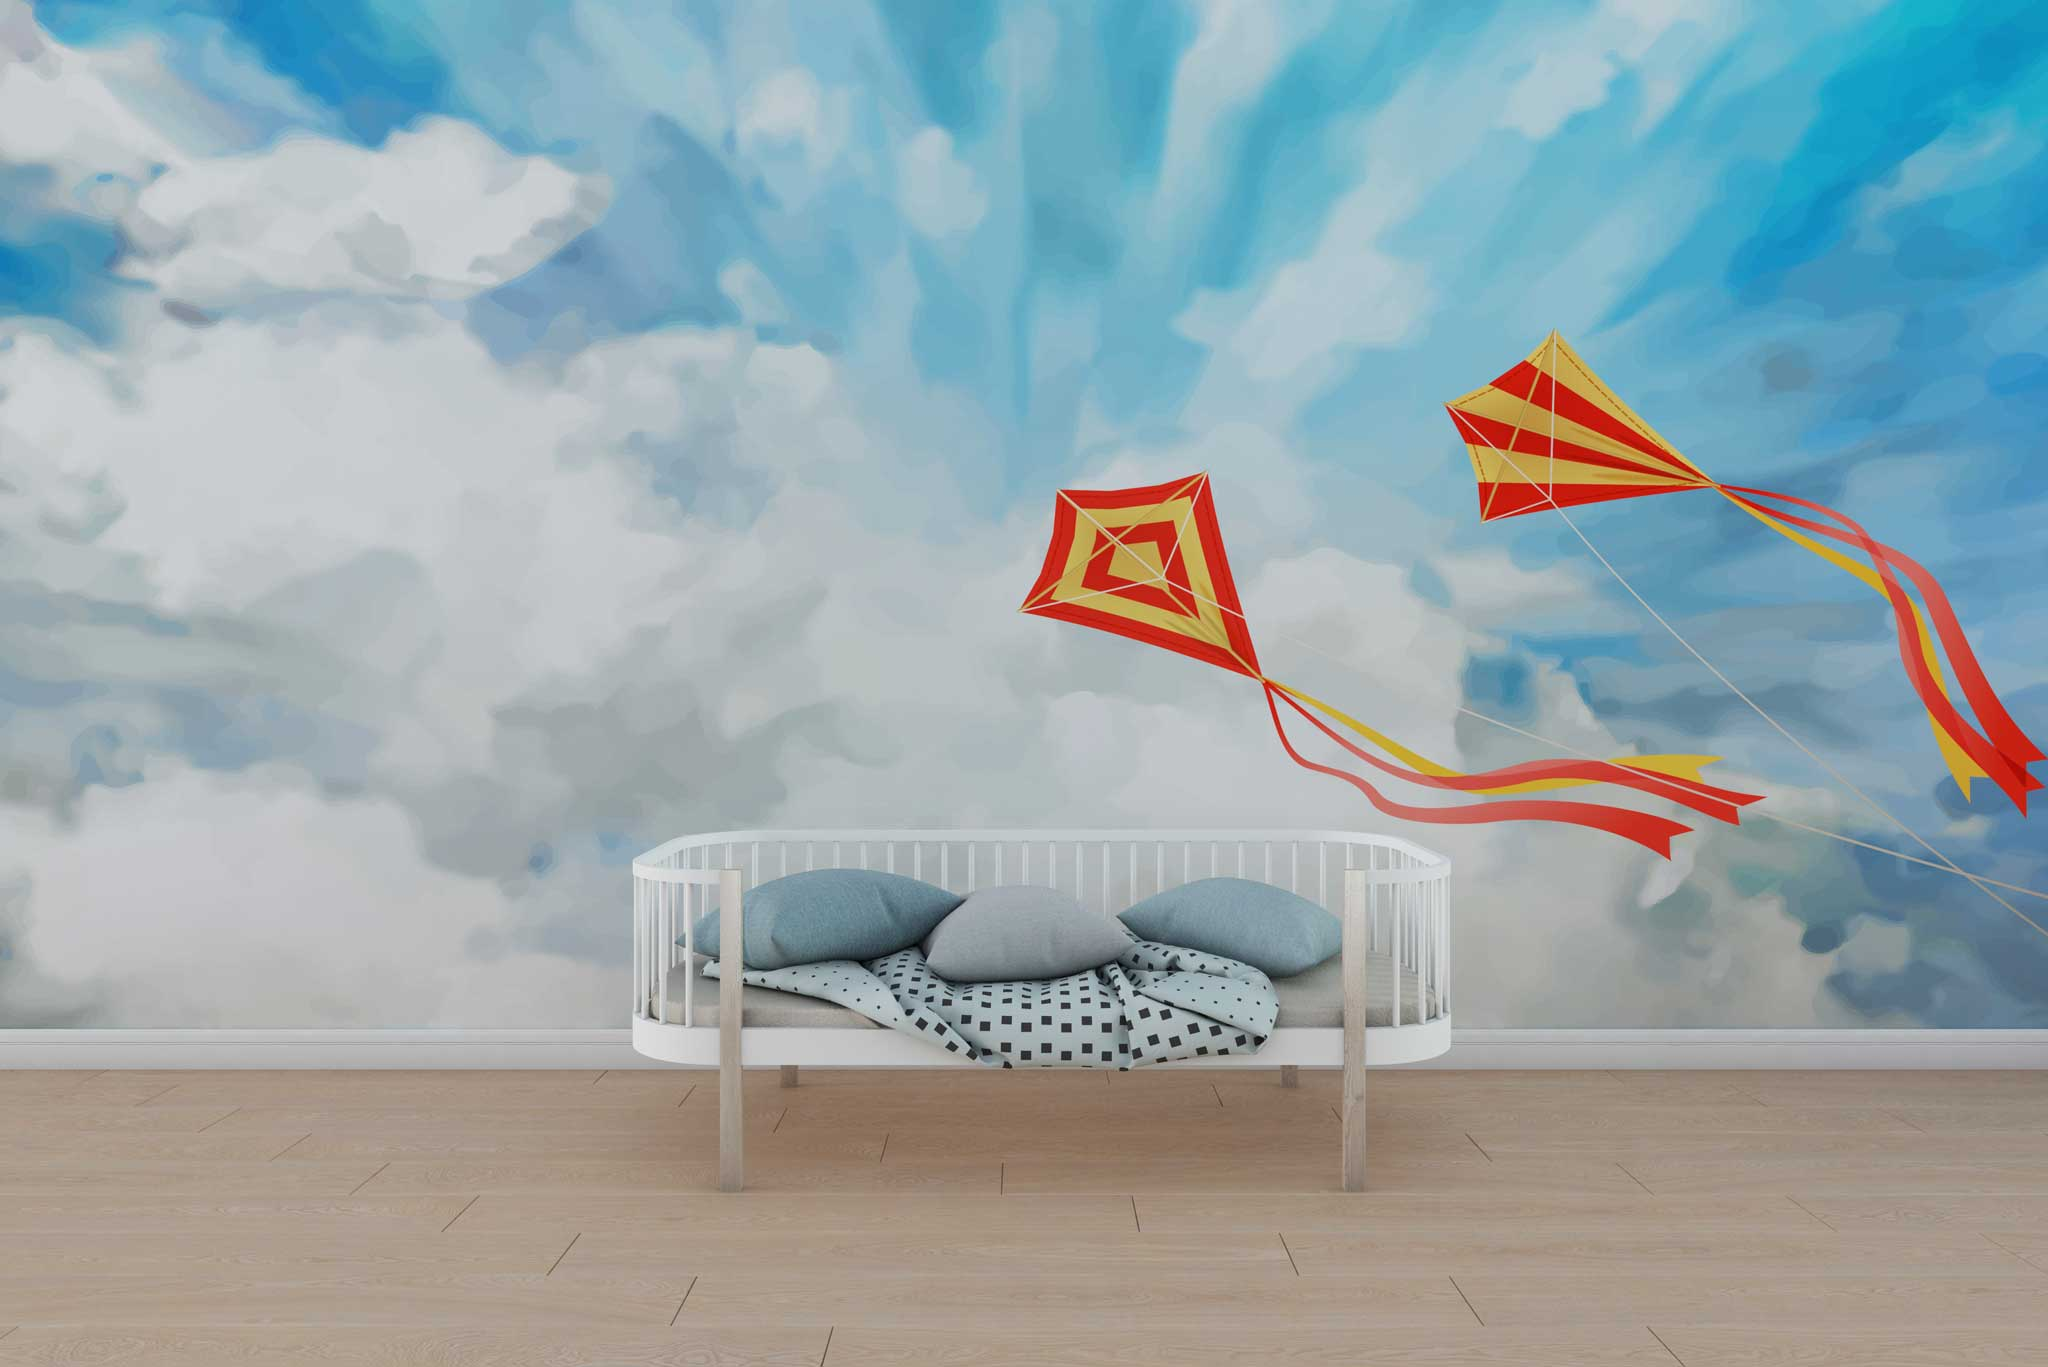 tapet-fototapet-design-personalizat-customizabil-comanda-special-camera-dormitor-copii-model-cer-senin-zmeie-rosu-galben-nori-albi-desen-pictura